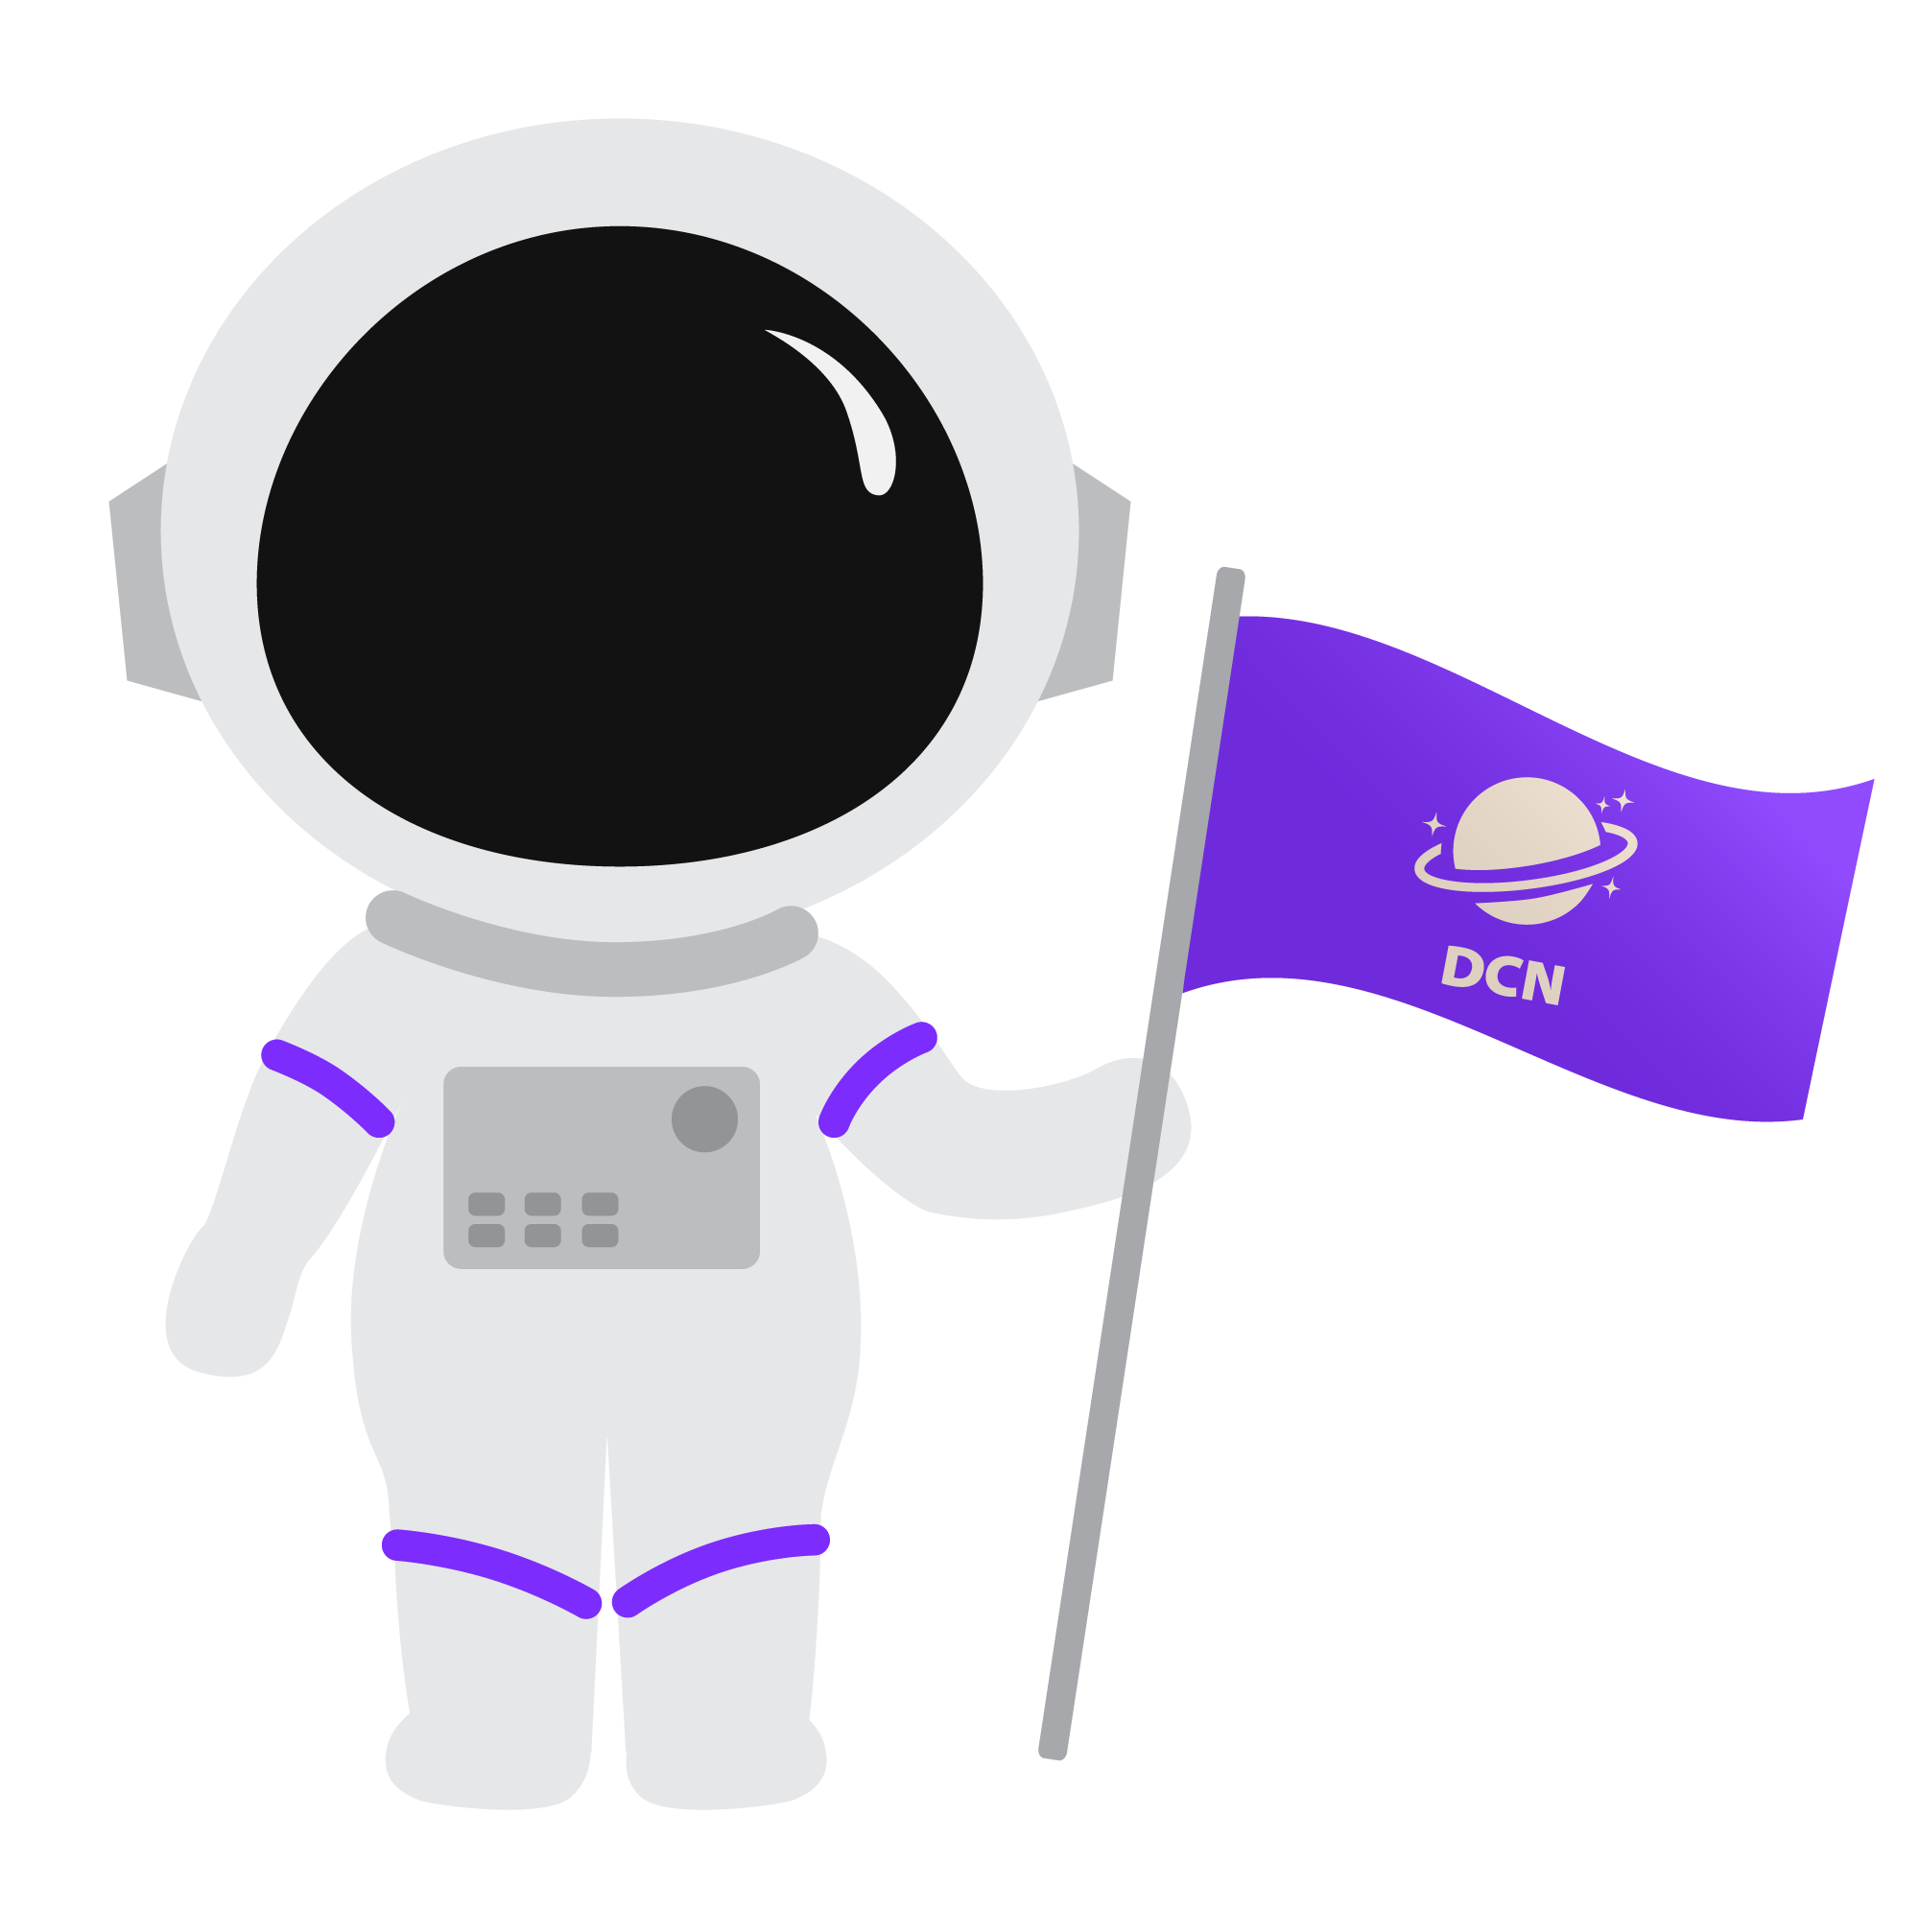 astronaut representing DCN